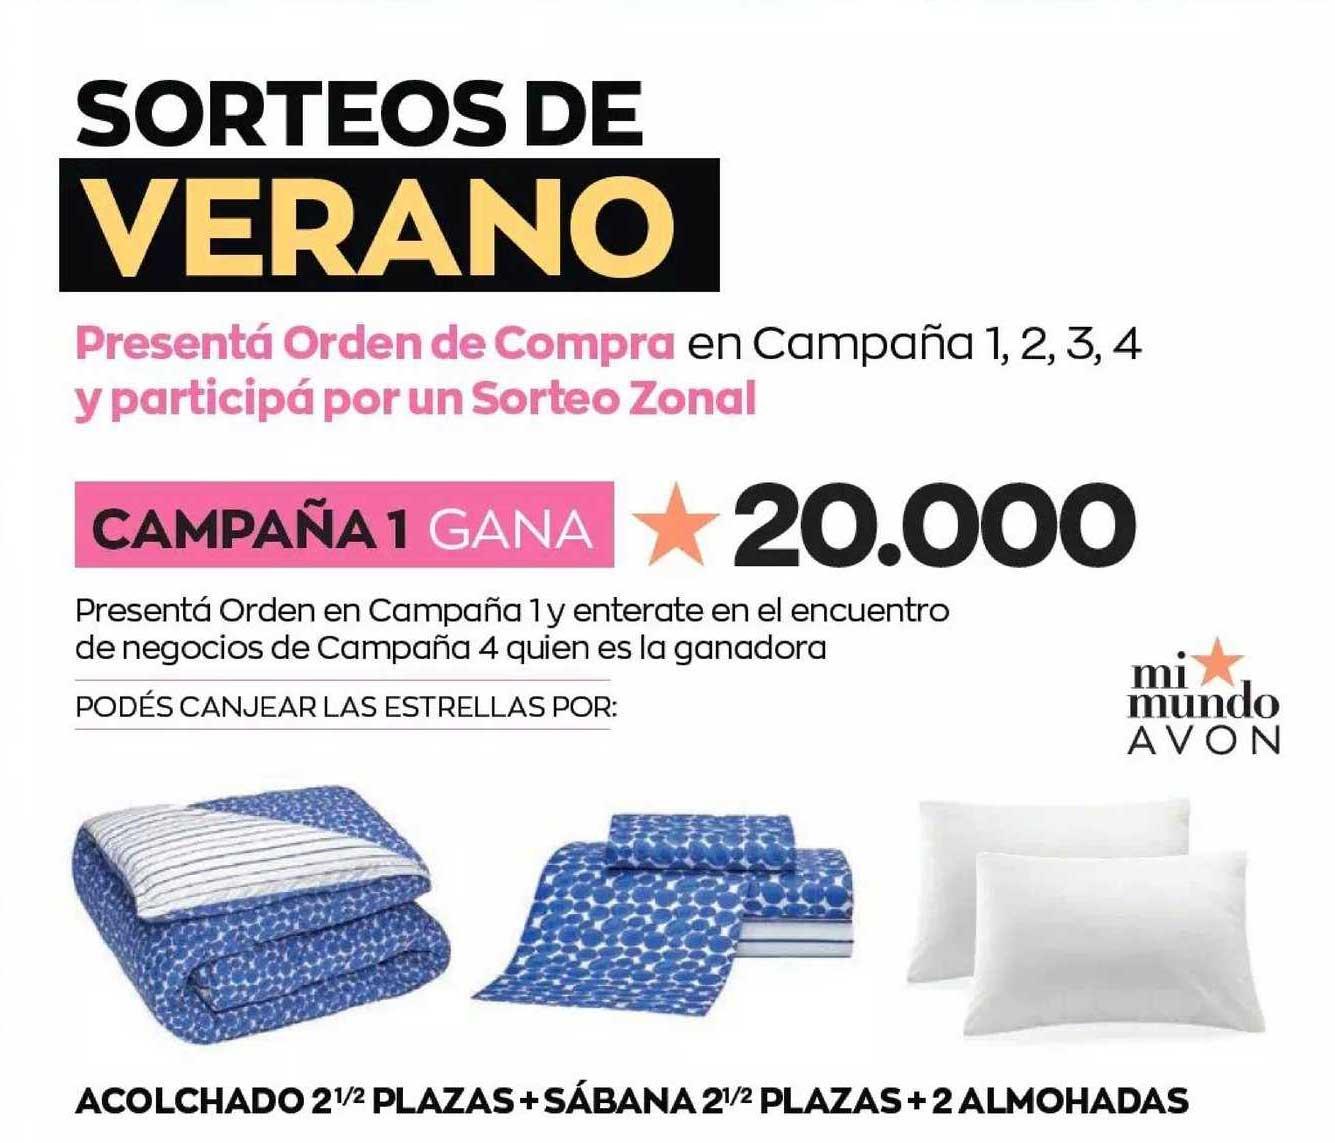 Avon Acolchado 2 1-2 Plazas + Sábanas 2 1-2 Plazas + 2 Almohadas